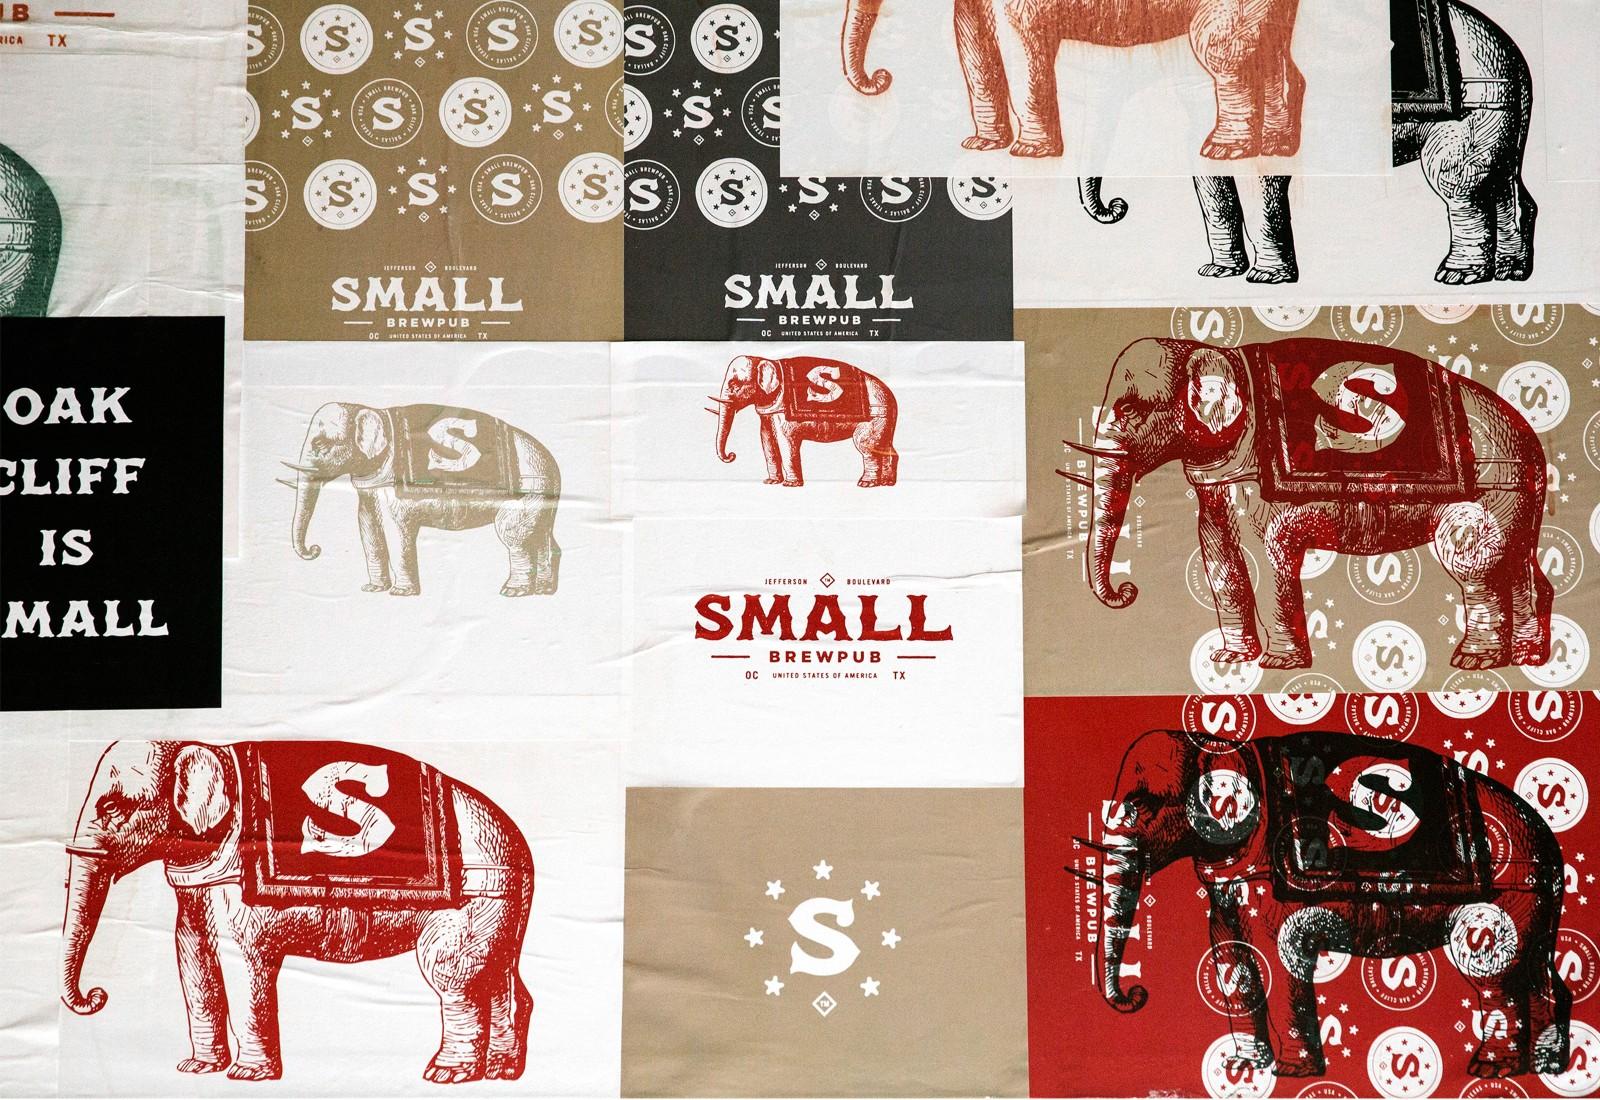 Beer & Branding: Small Brewpub